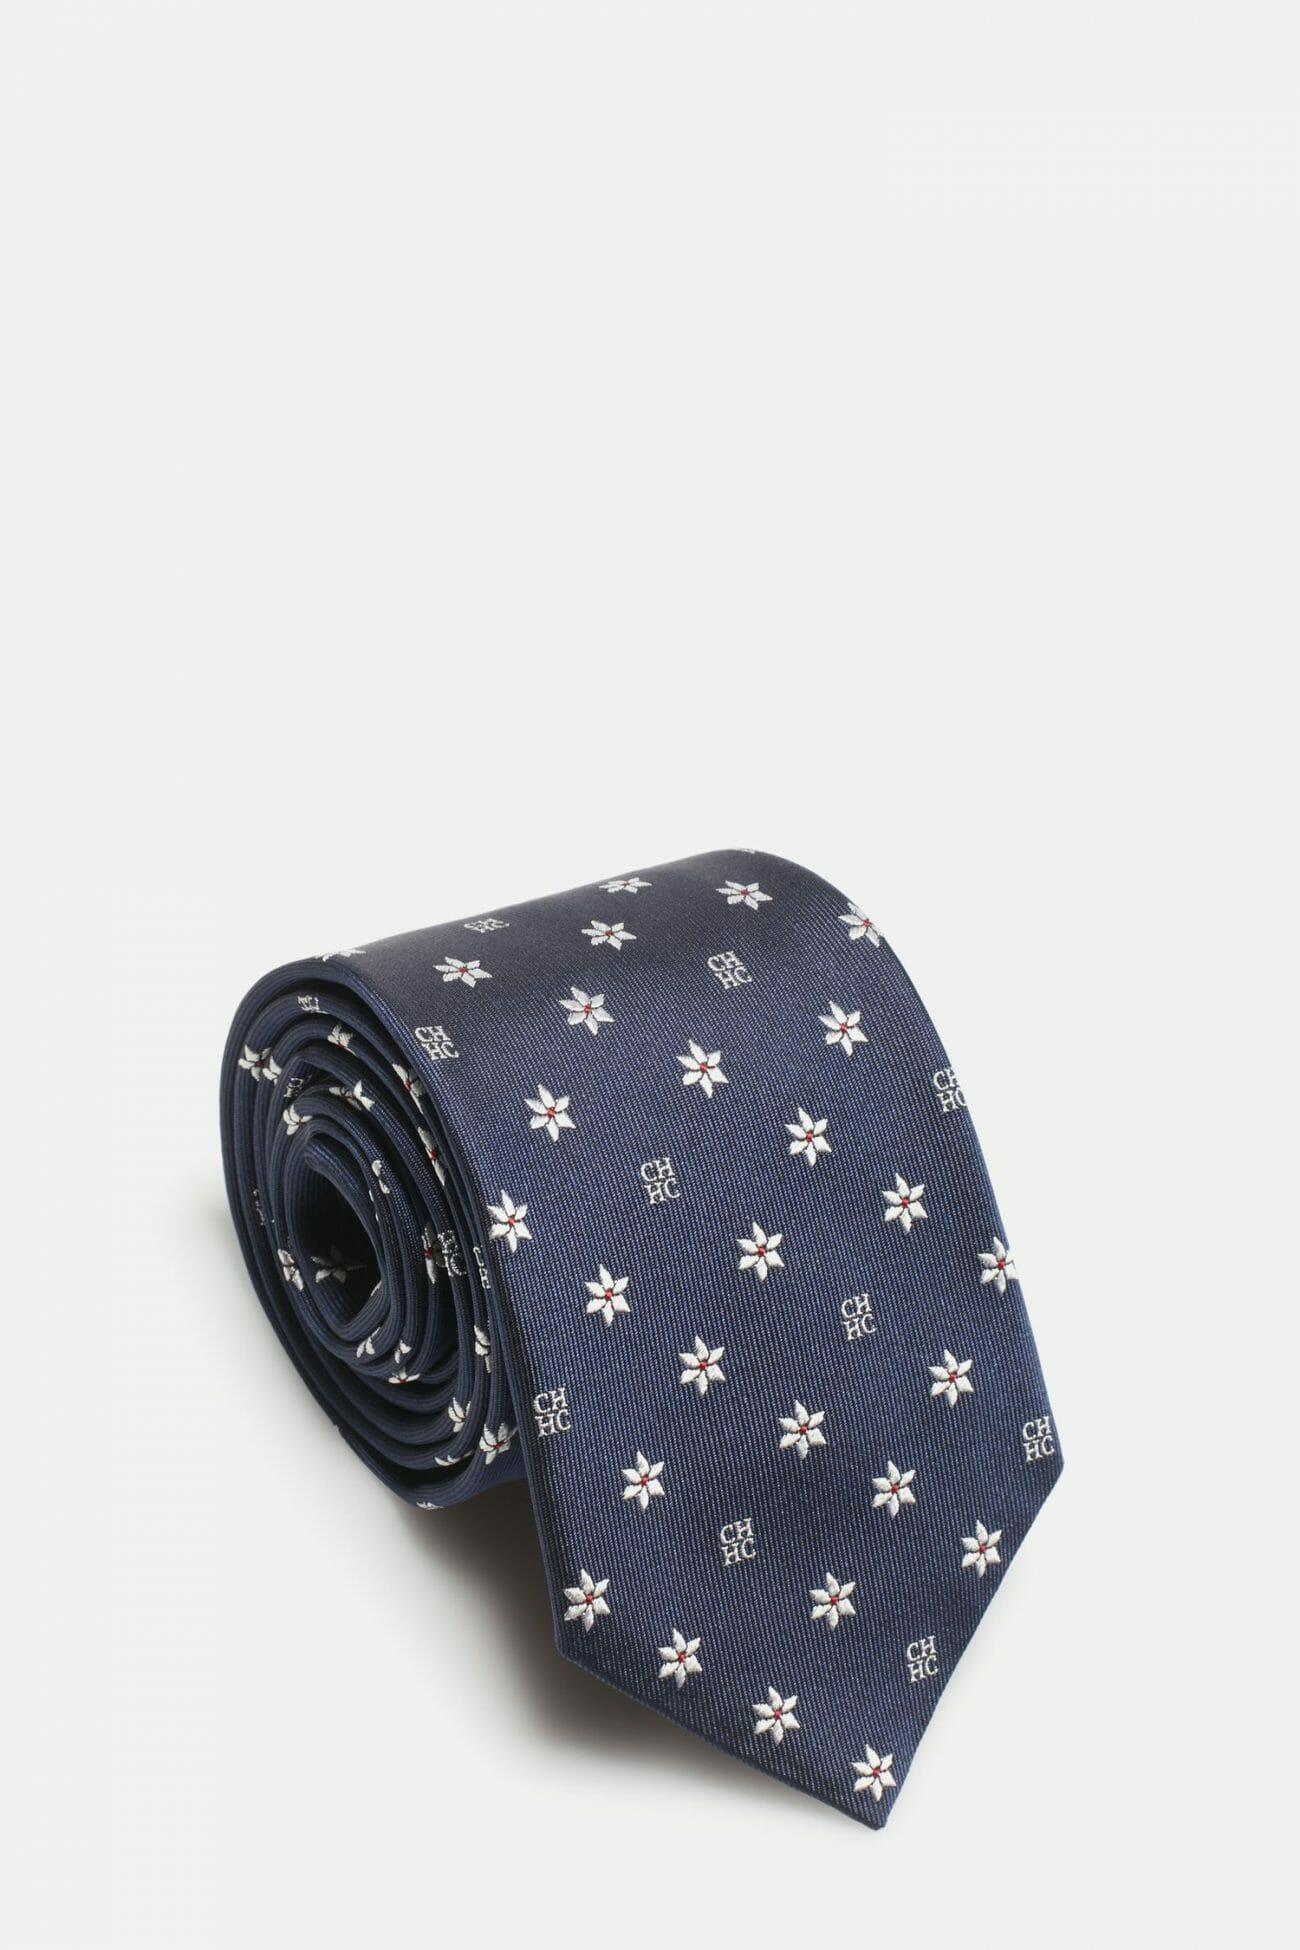 CH-Carolina-herrera-men-accessories-look-34